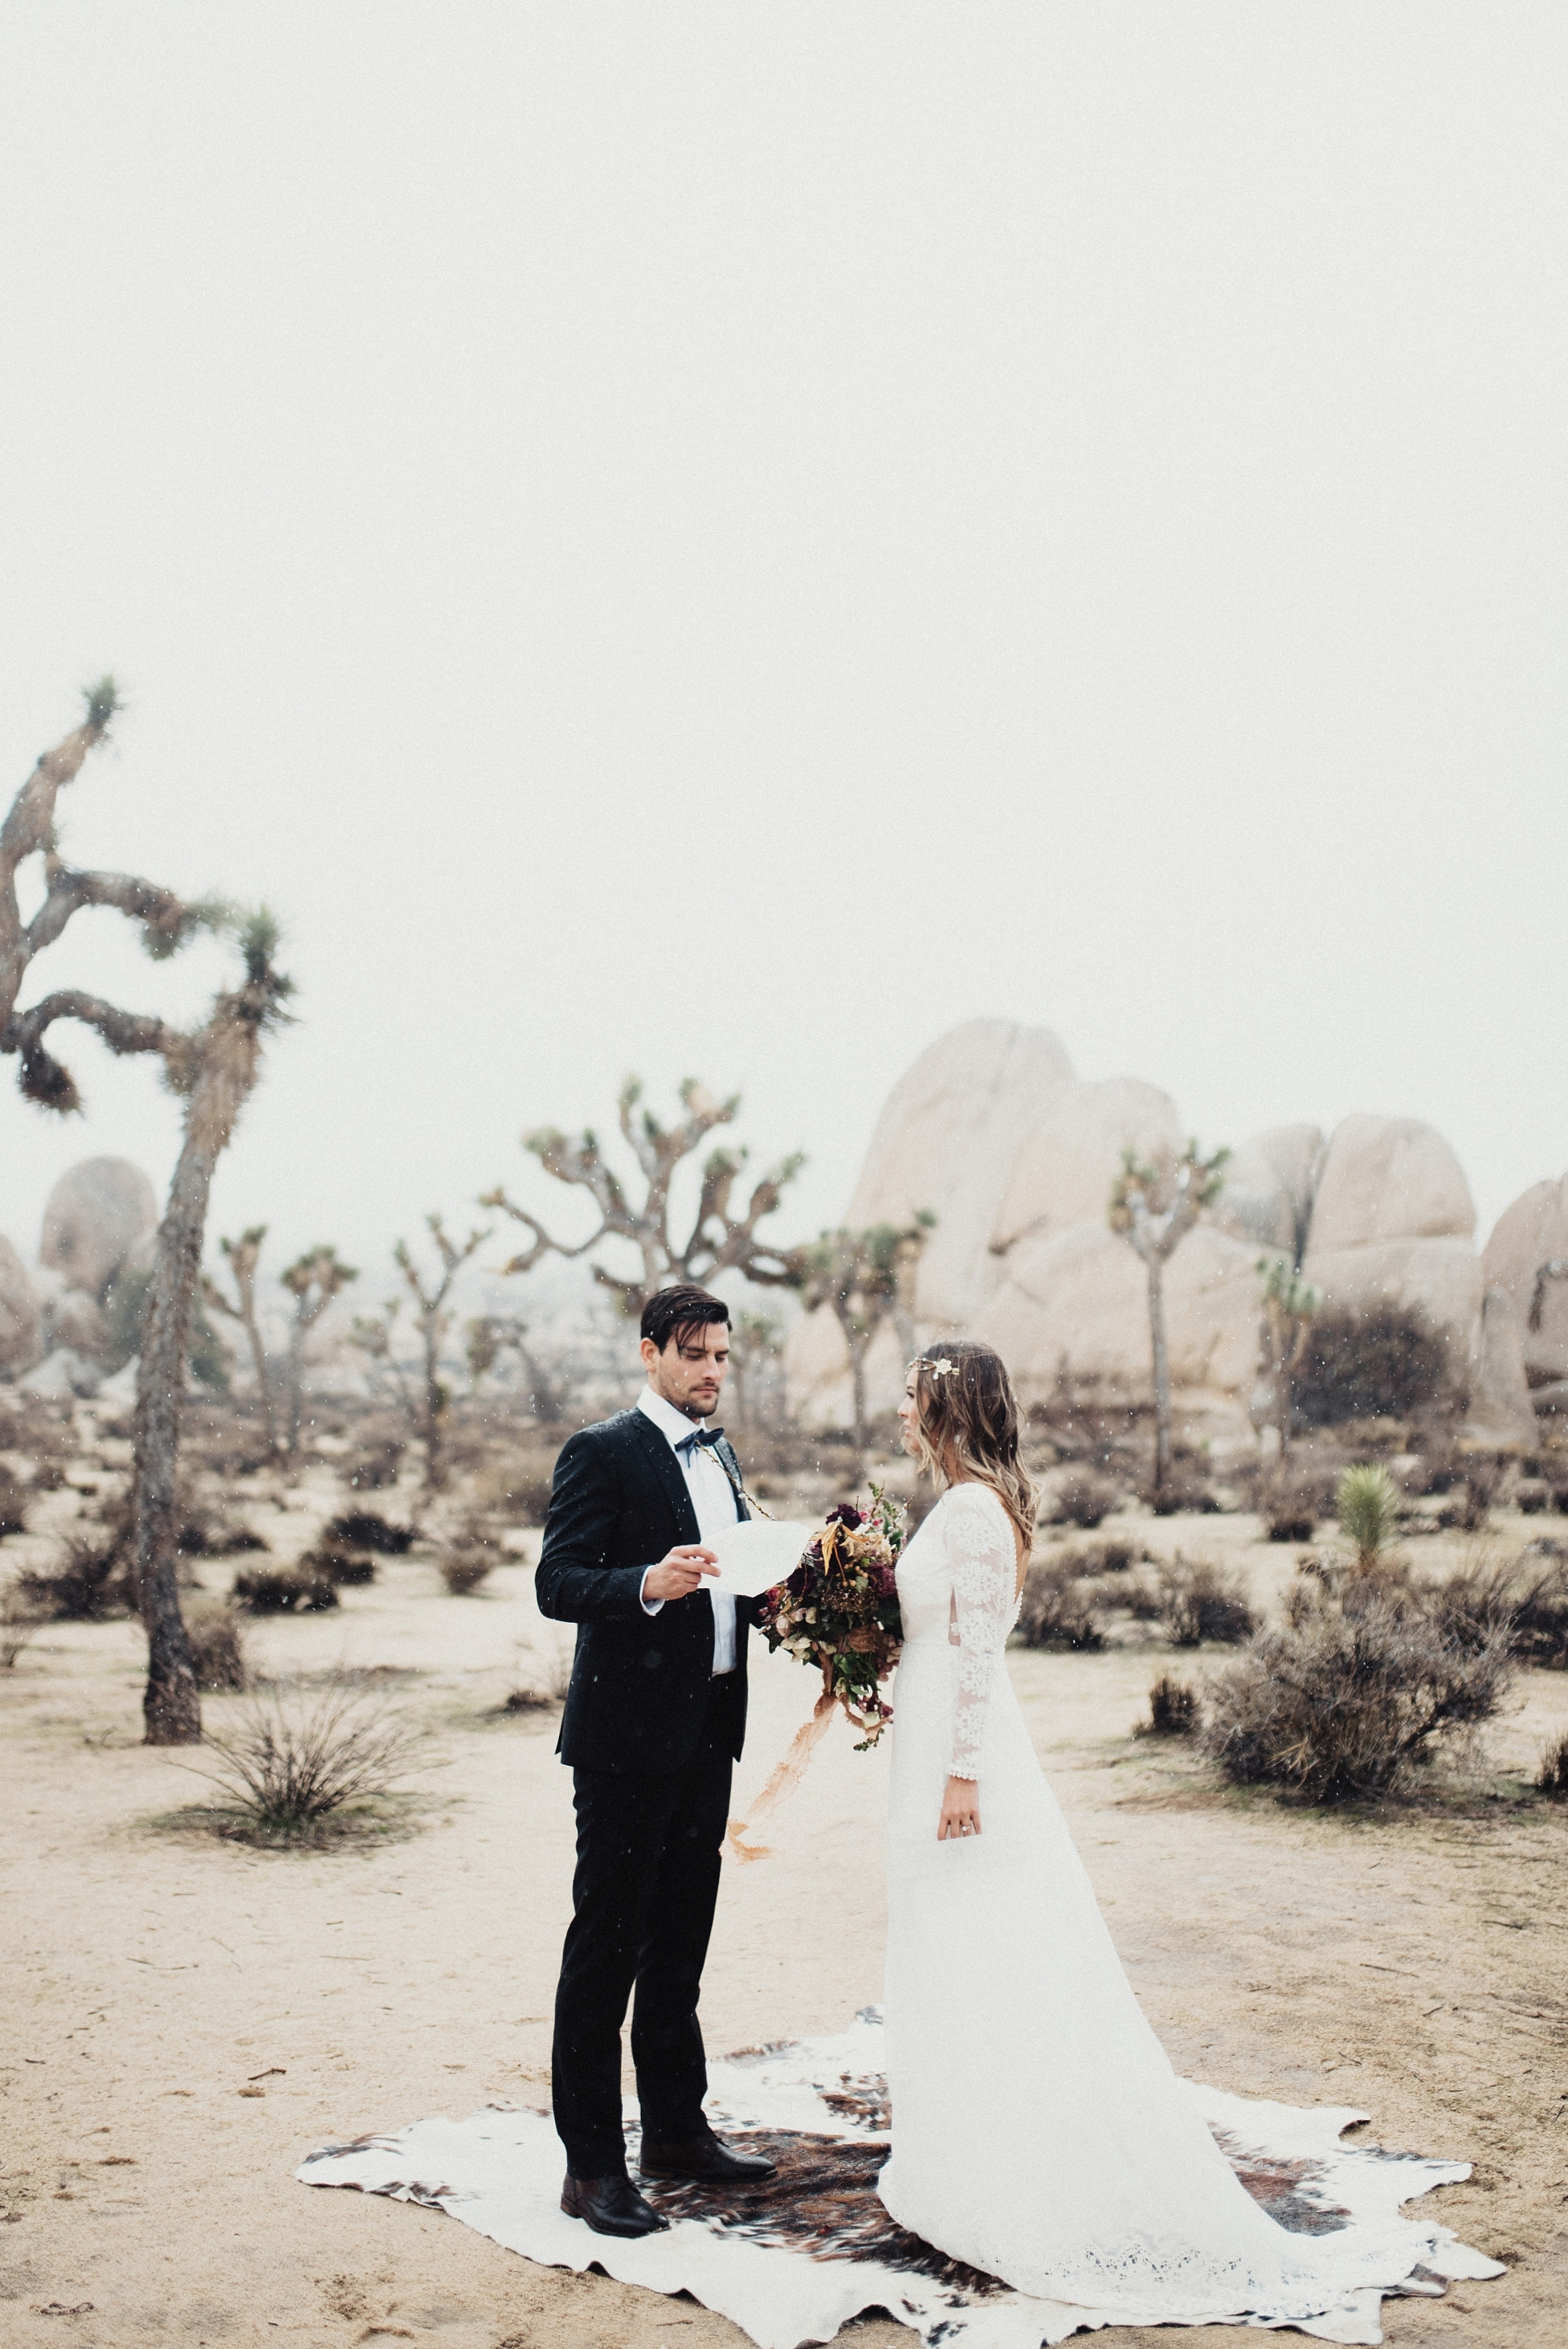 edenstraderphoto-weddingphotographer_1339.jpg